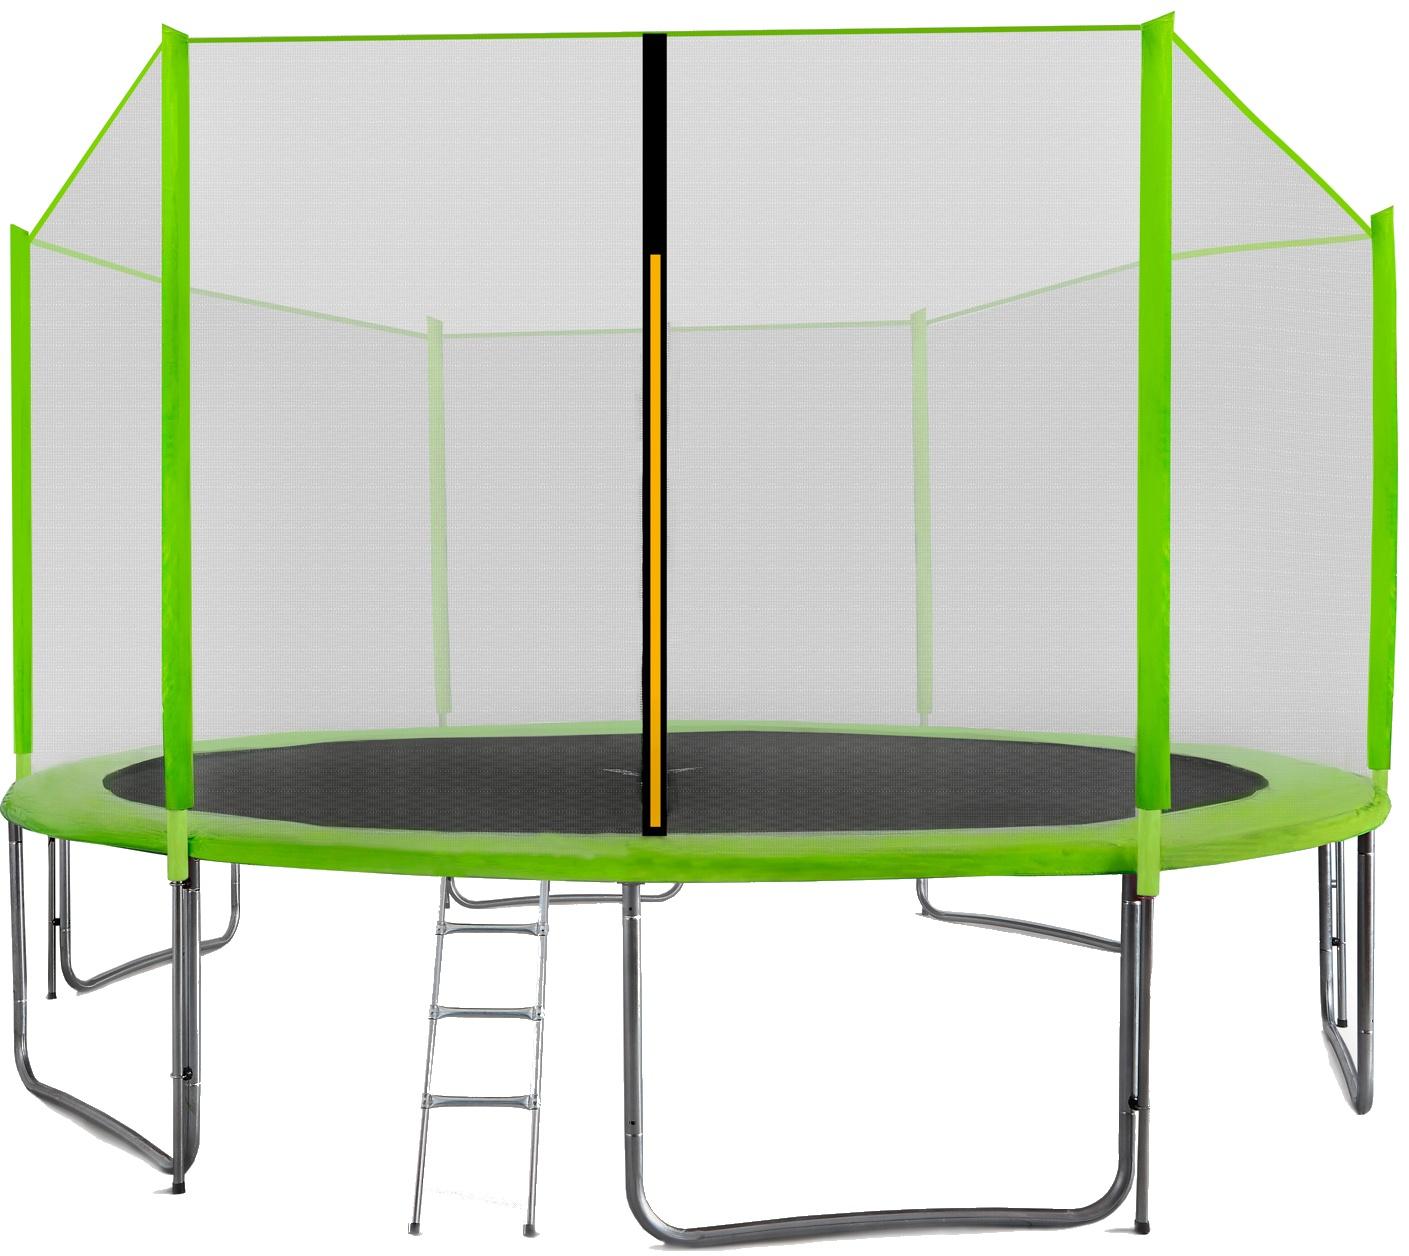 Aga SPORT PRO Trampolína 430 cm Light Green + ochranná síť  + žebřík + kapsa na obuv + krycí plachta